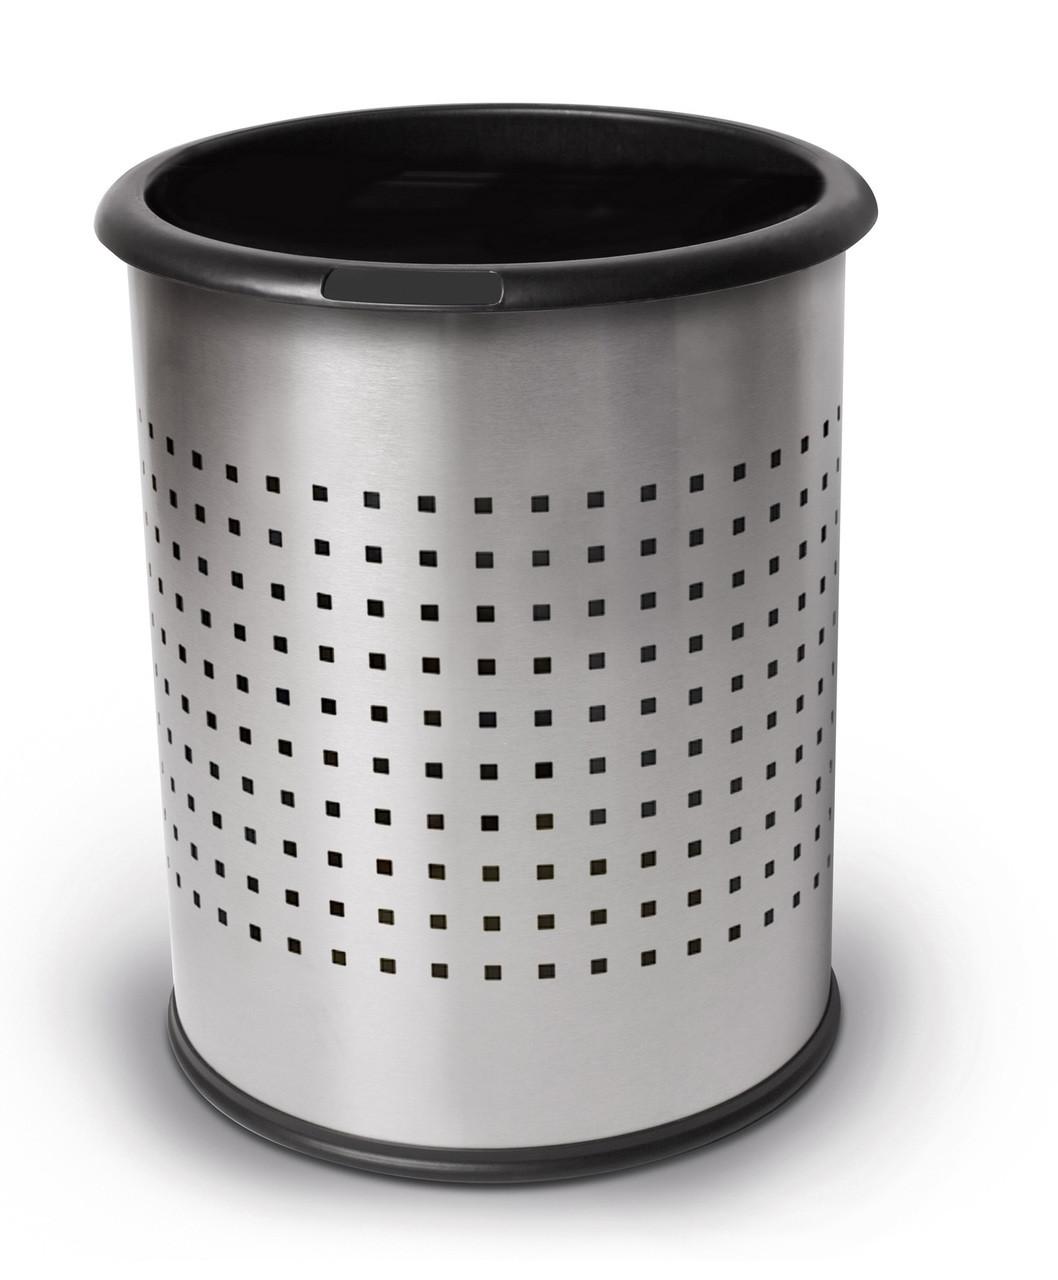 3 Gallon Stainless Steel Wastebasket Perforated Steel 785229